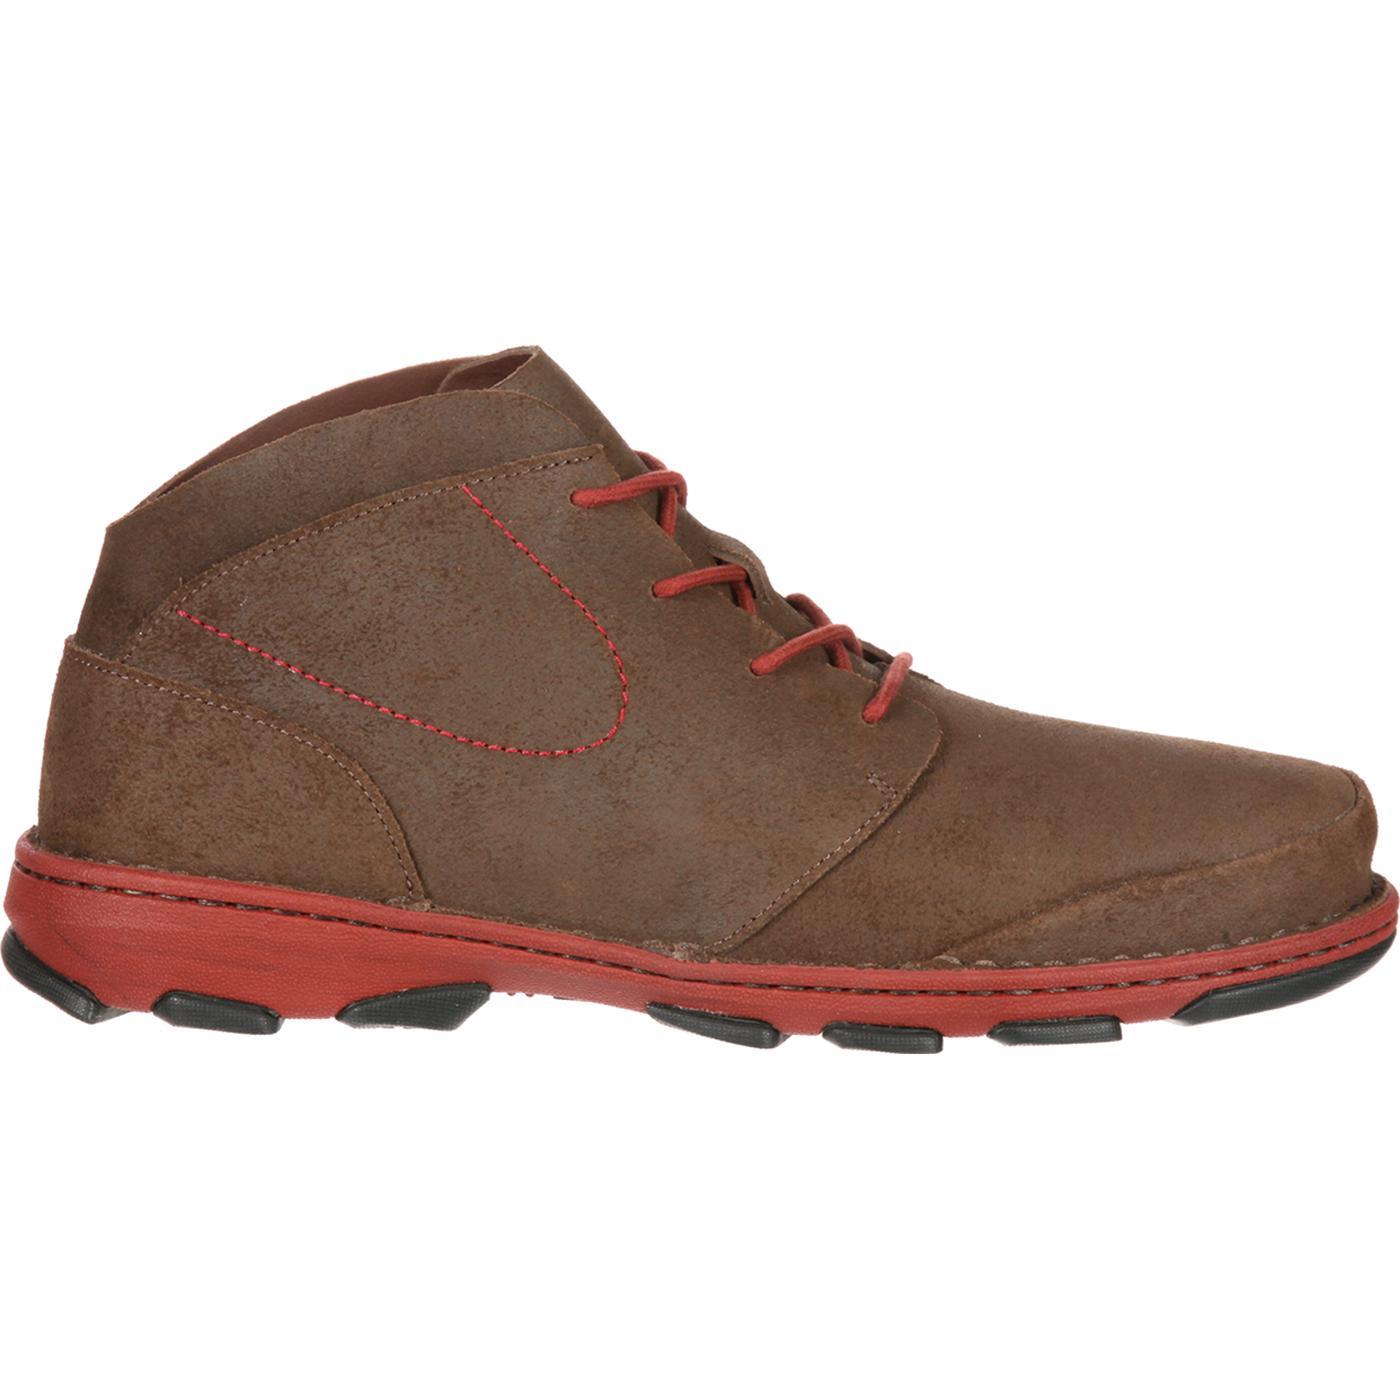 waterproof hi s boots tough bk men shoes dryshod barnyard black dungho boot comfortable product mens dng comforter mh work